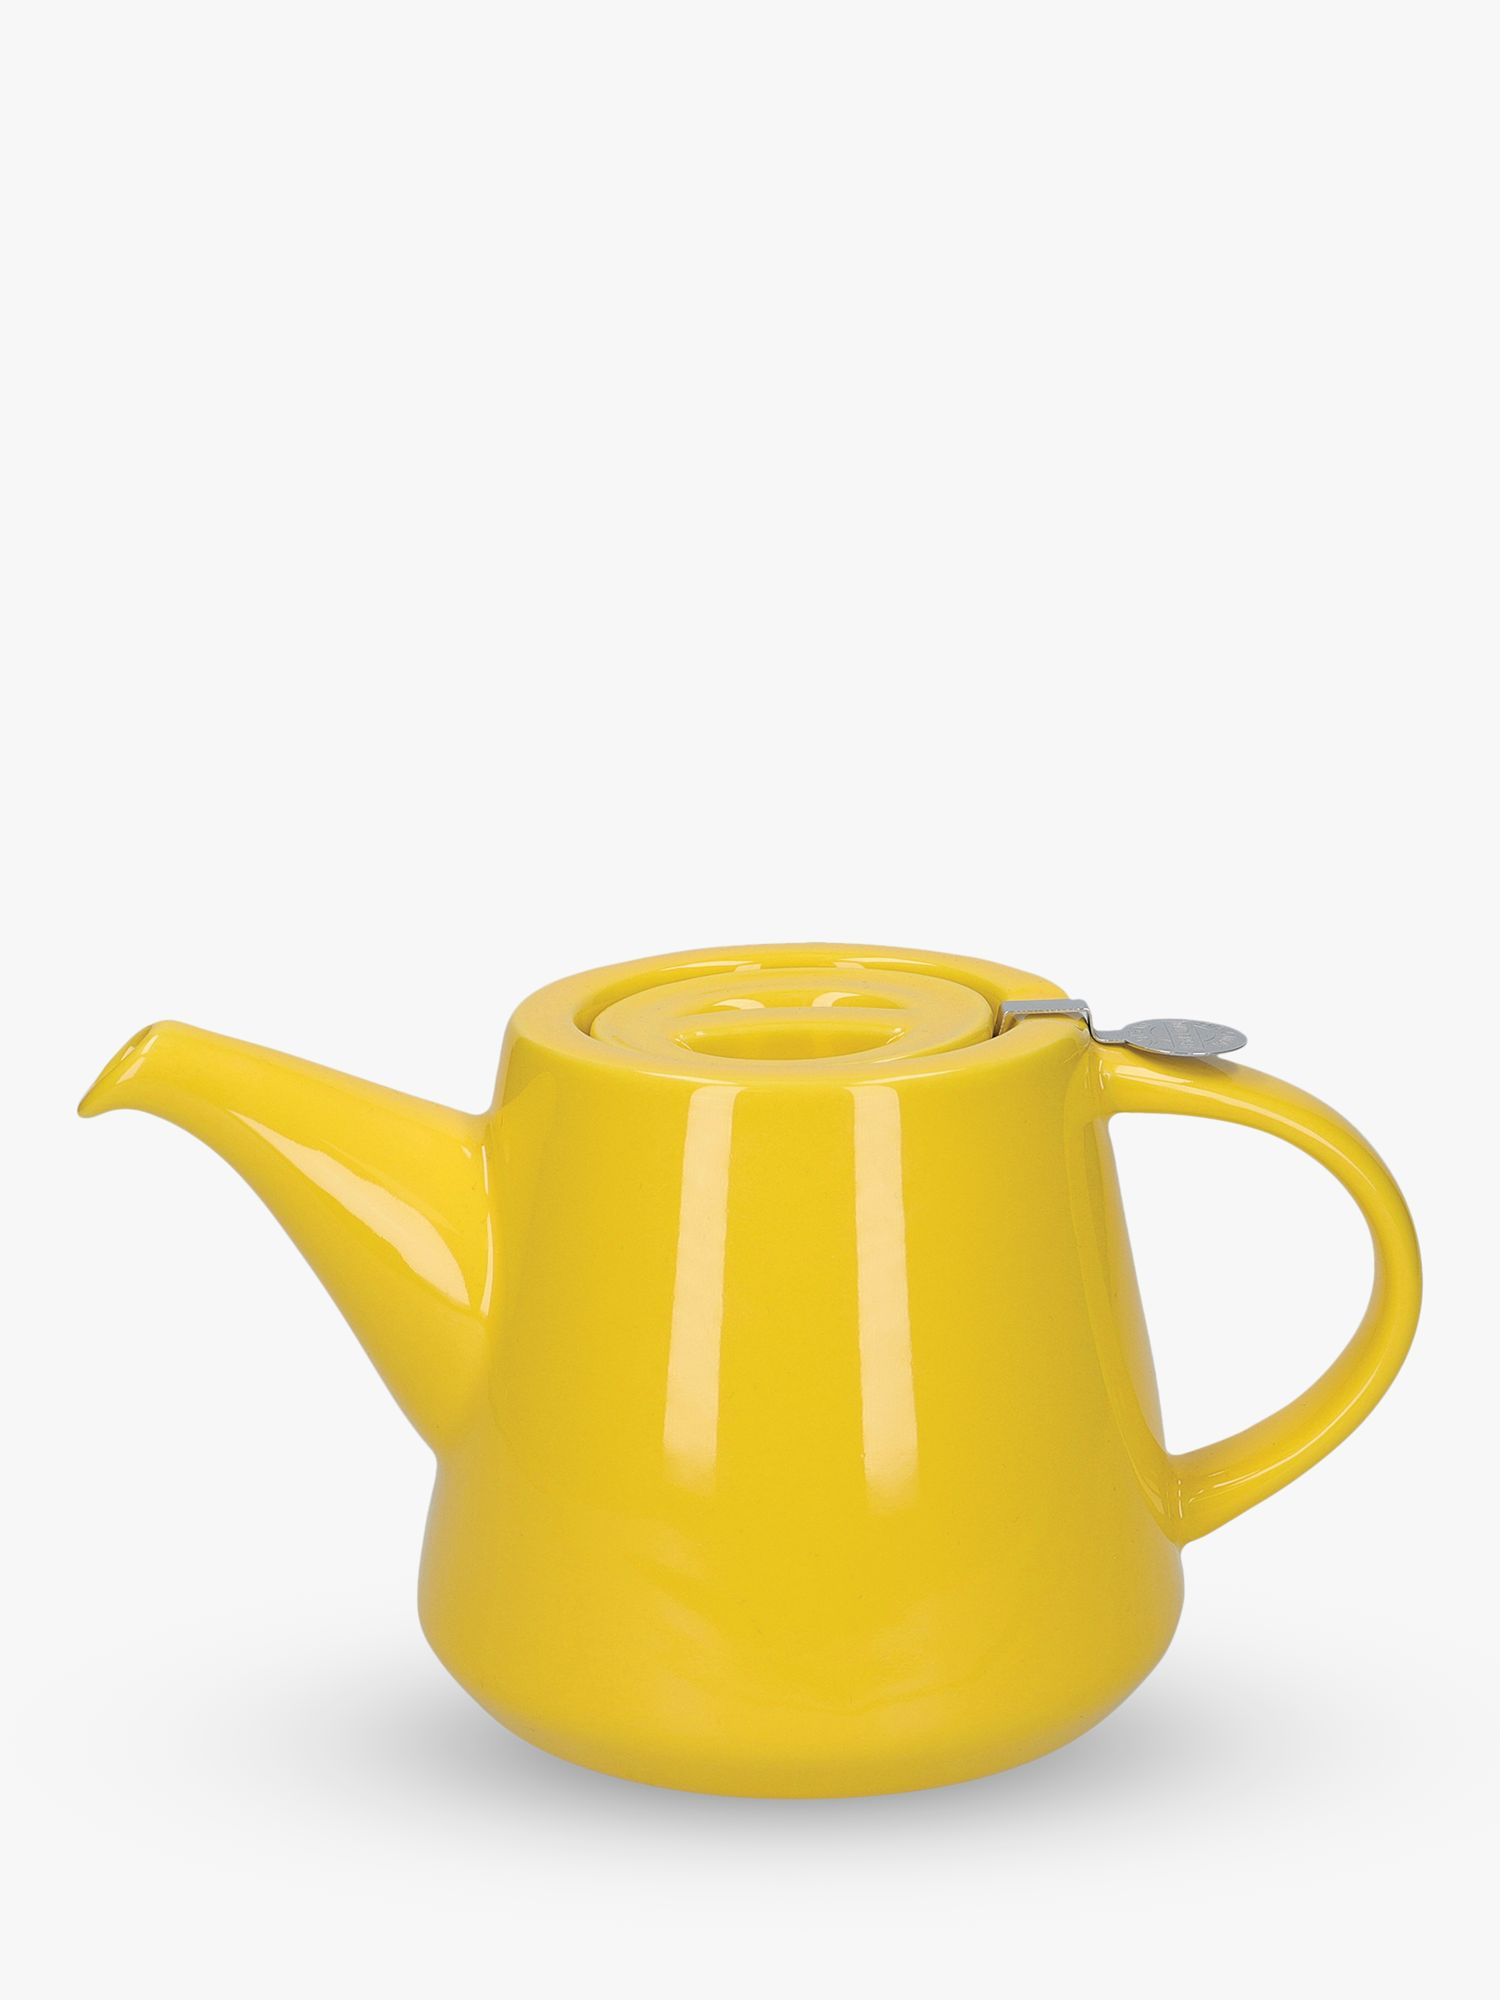 London Pottery Hi-T 2 Cup Teapot, 650ml